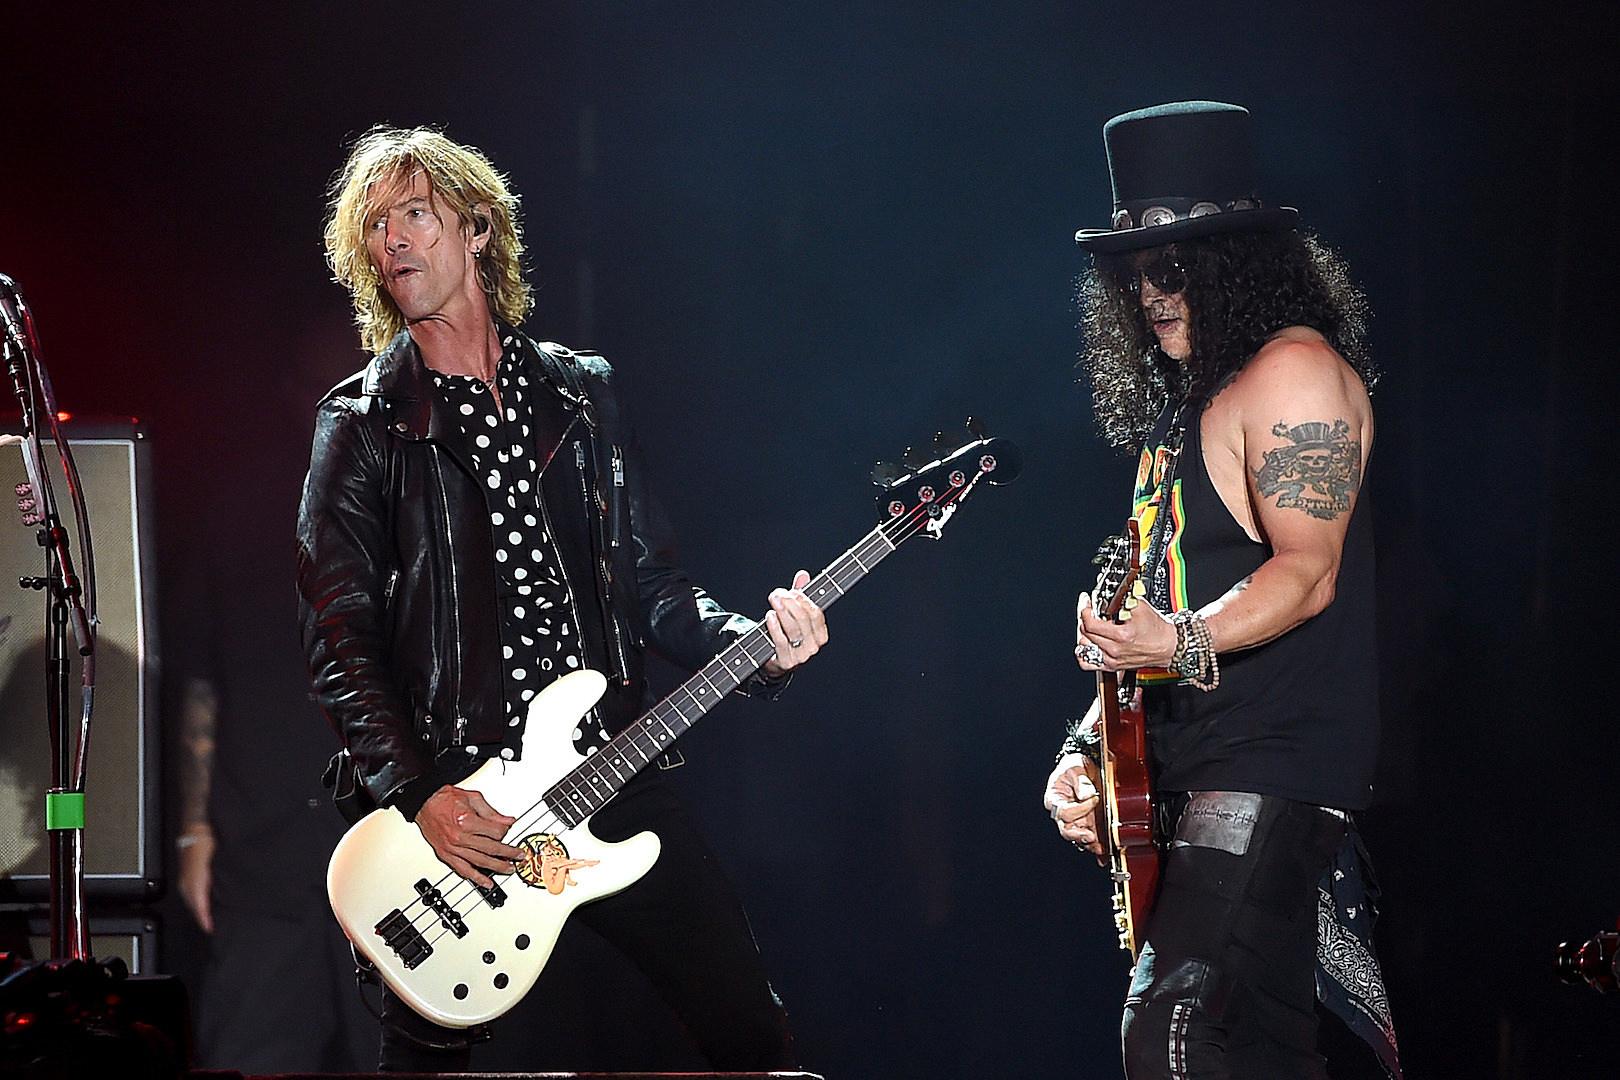 Guns N' Roses to Play 2020 Super Bowl Music Festival